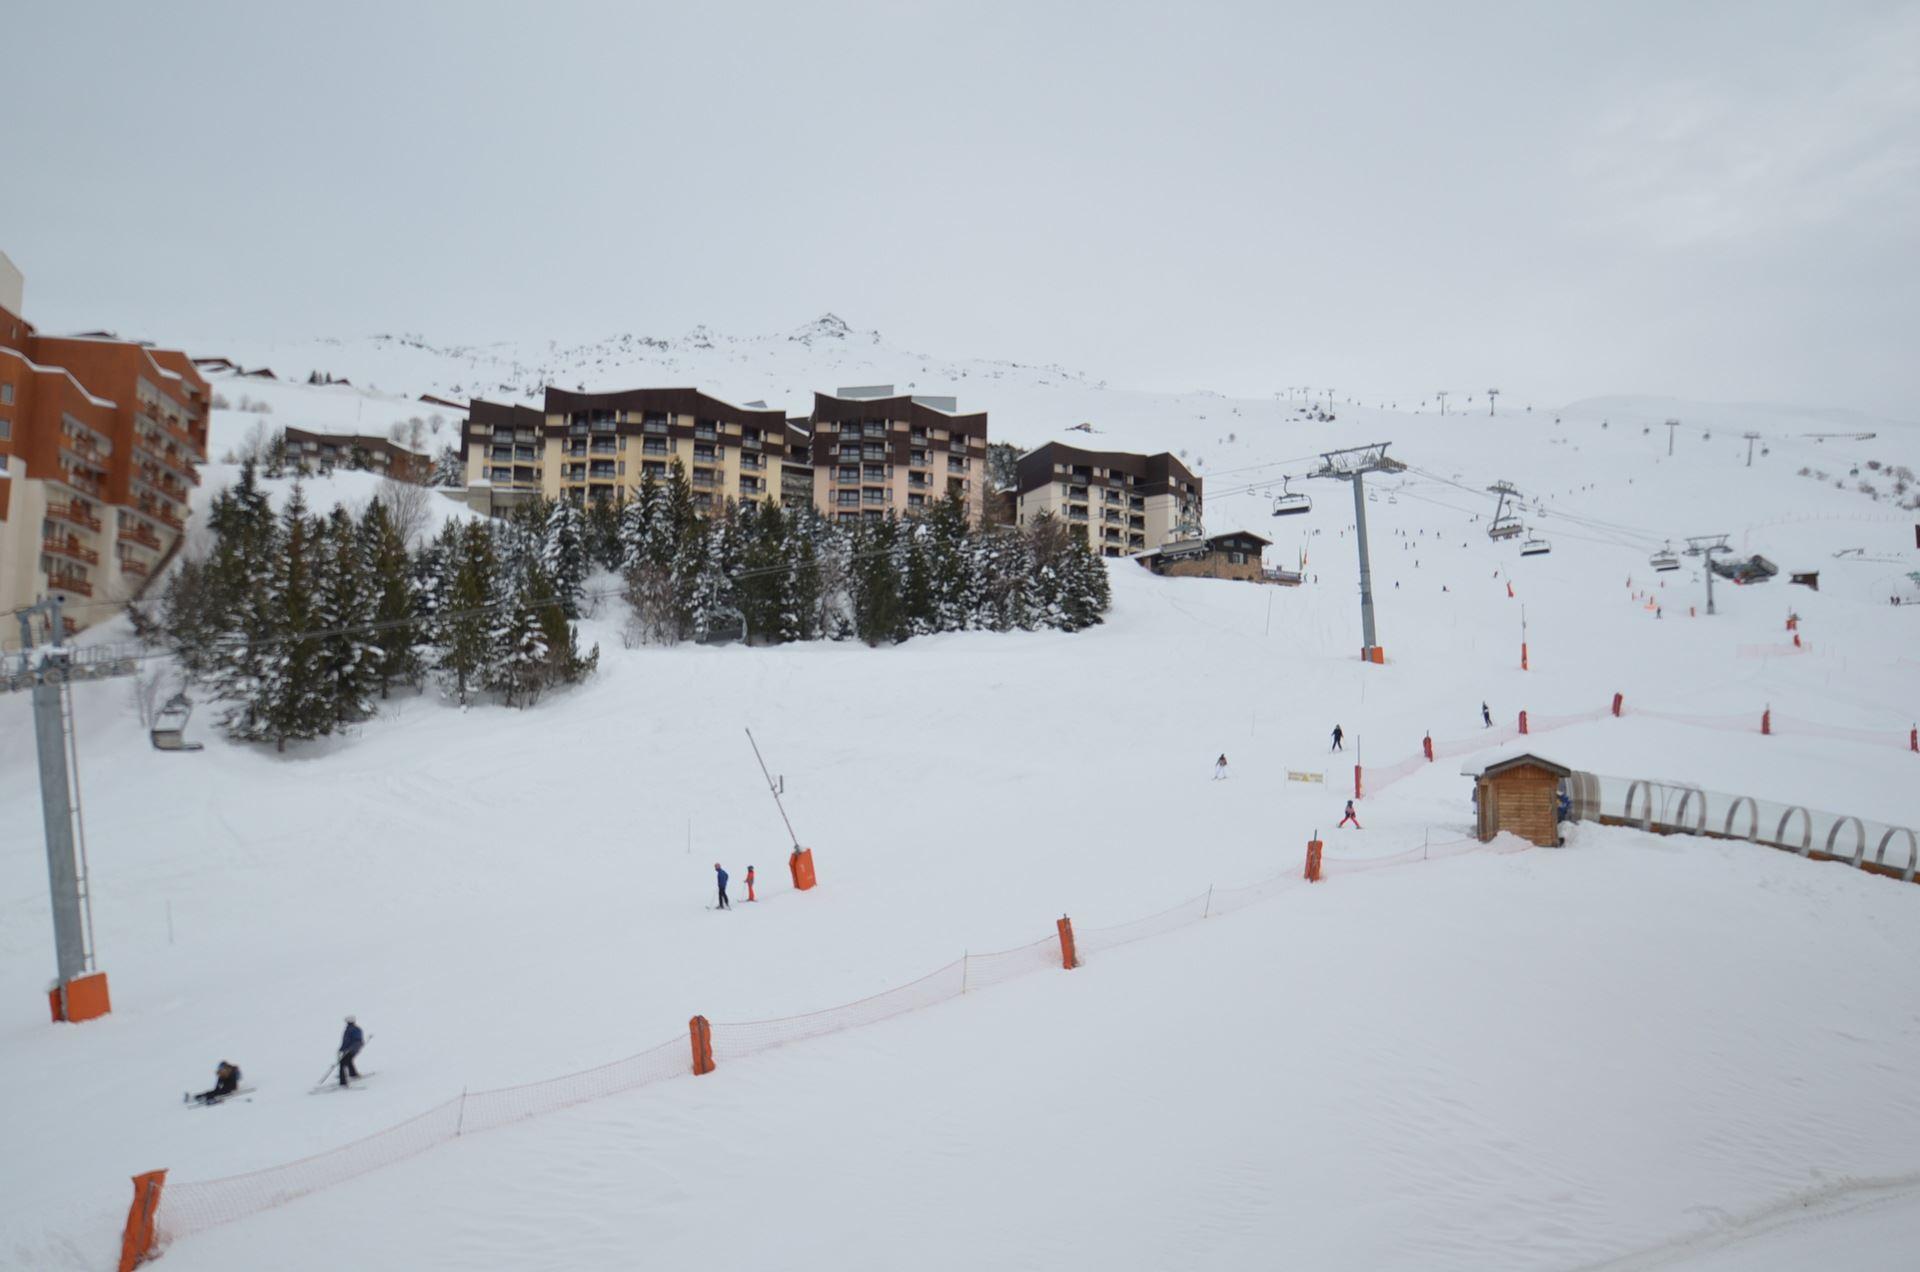 2 Room 4 Pers ski-in ski-out / Aconit 504